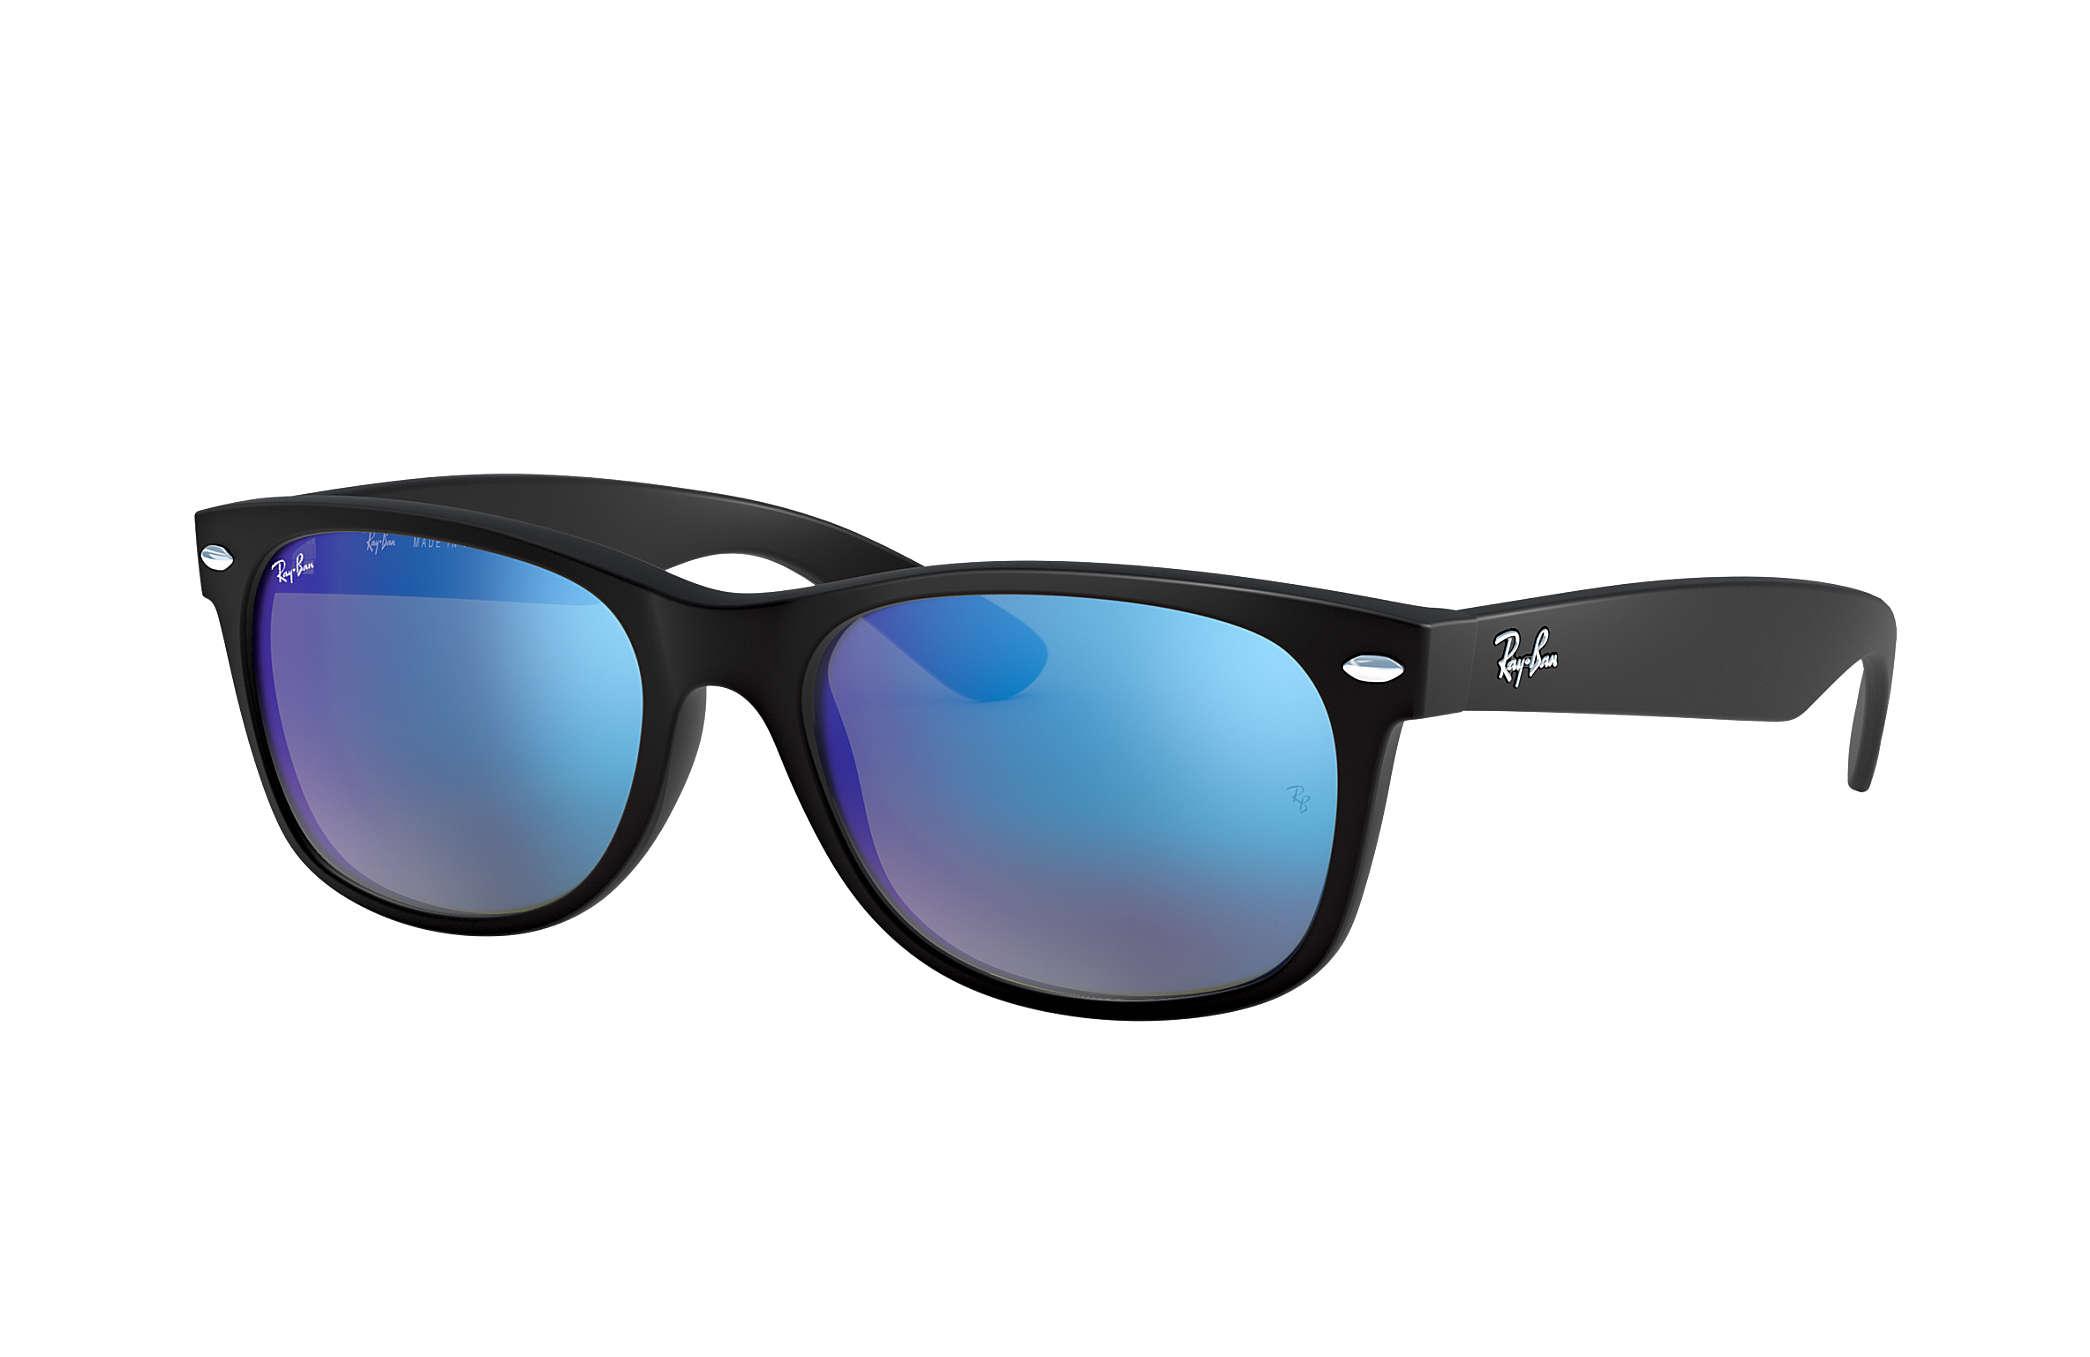 7c21c2924c9 Turquoise Ray Ban Wayfarer Sunglasses « Heritage Malta